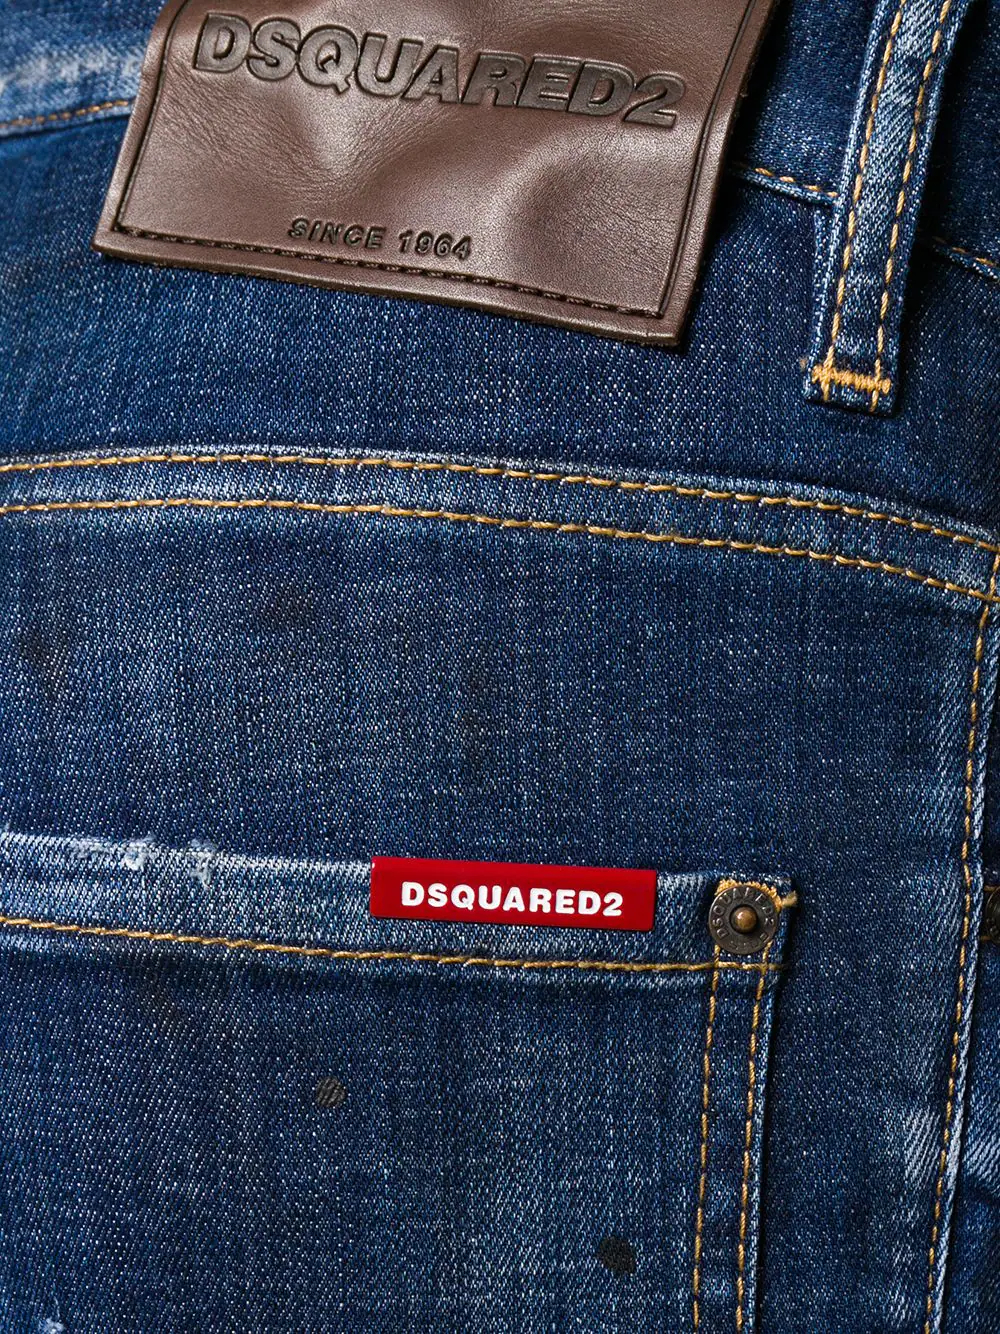 DSQUARED2 | Dsquared2 укороченные джинсы со вставками | Clouty